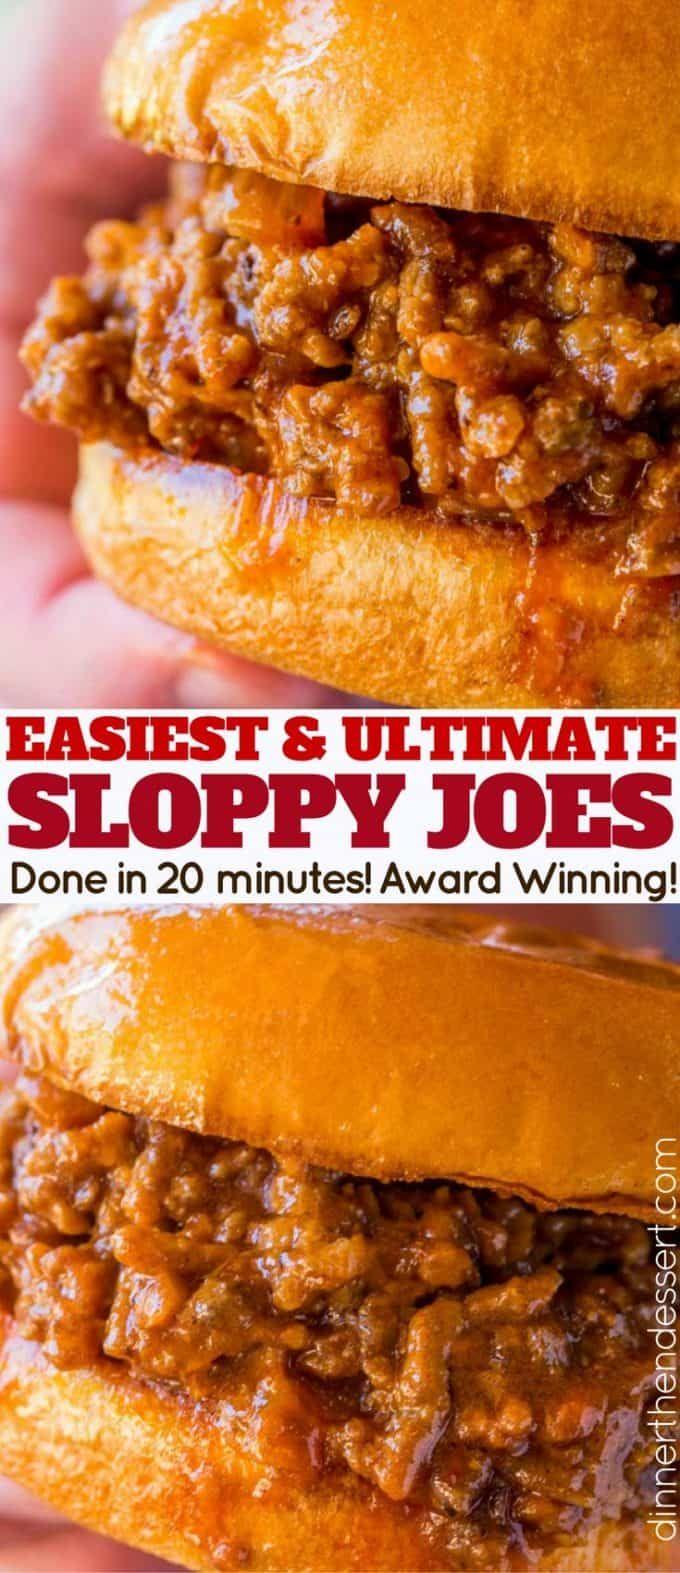 Award Winning Sloppy Joes (in 20 minutes!) - Dinner, then Dessert